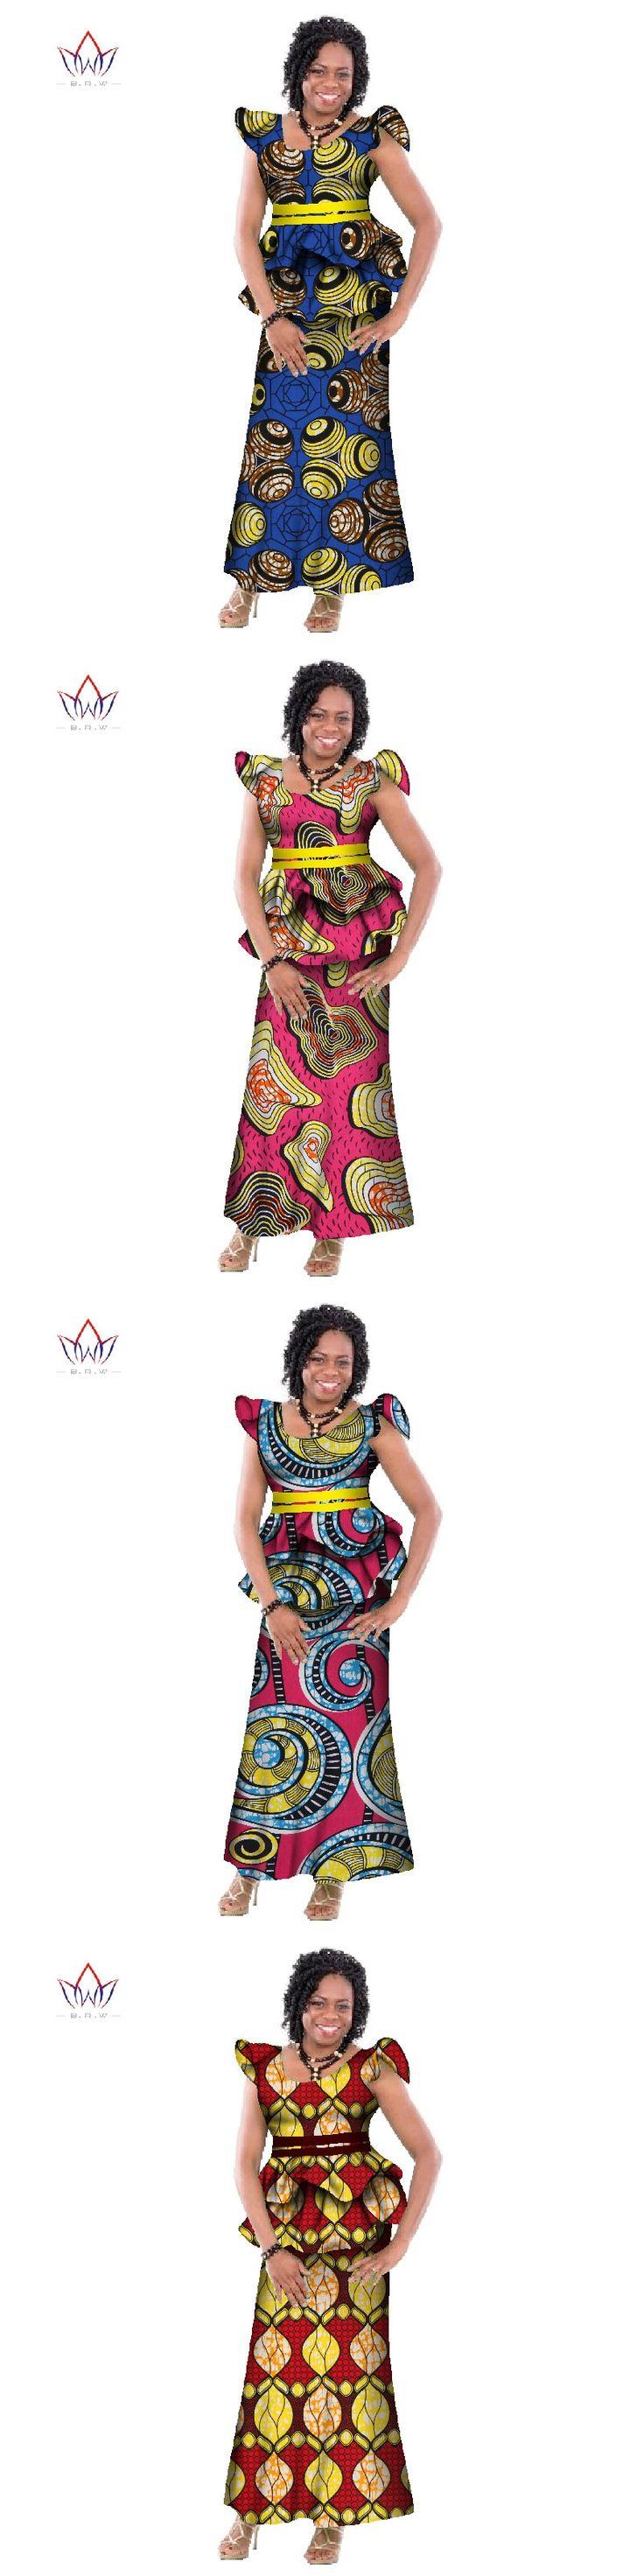 2017 Fashion New Bazin Riche African Wax Print Skirt Custom Clothing African Dashiki Fabric Plus Size Skirt Sets Women WY164